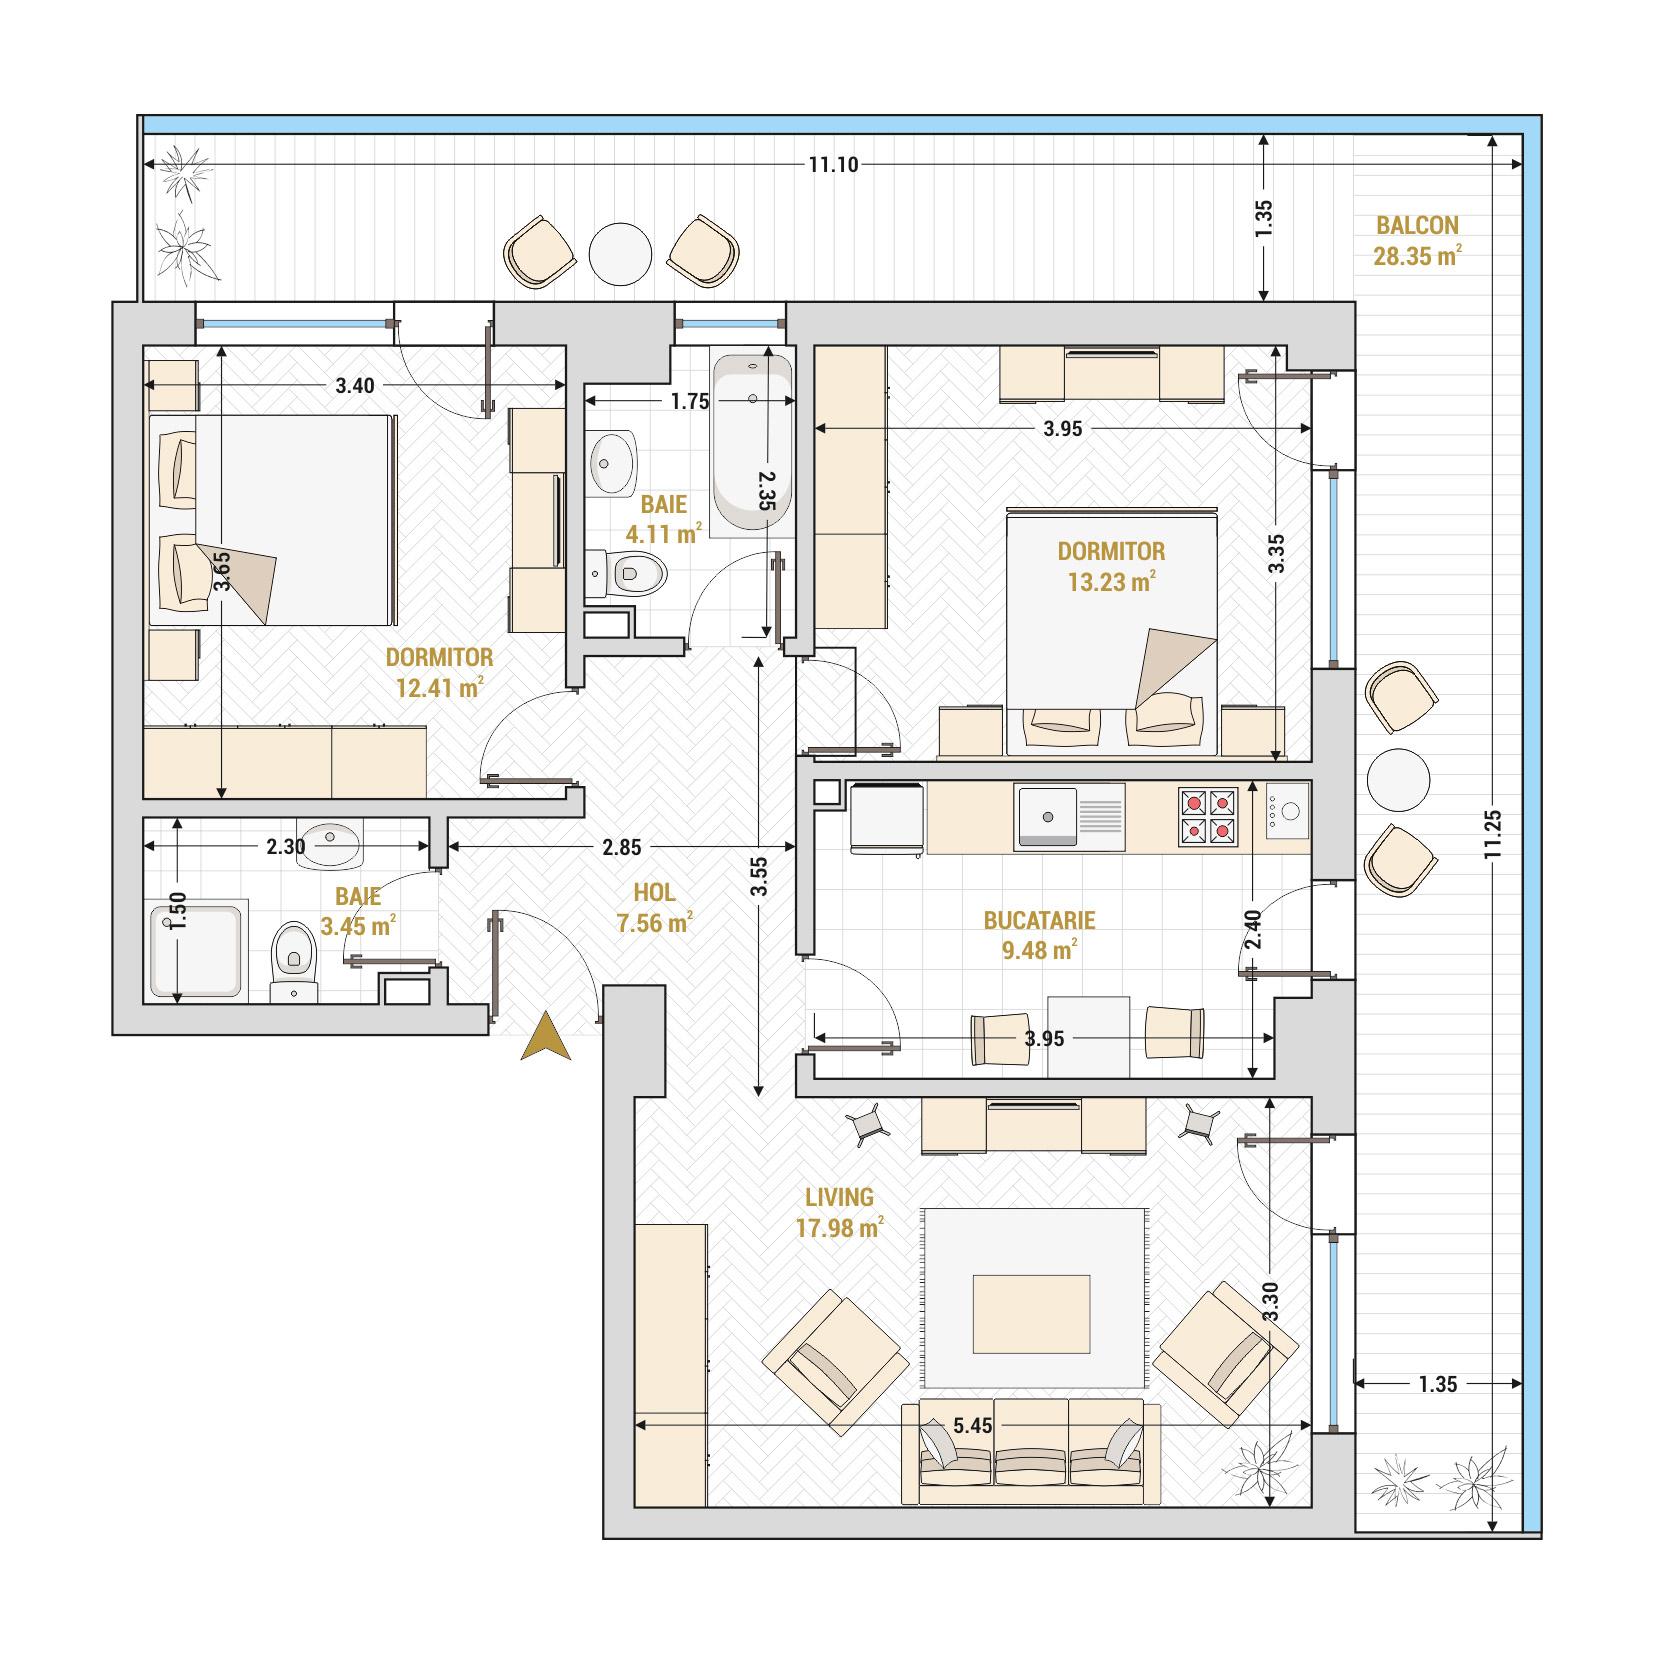 Apartament 3 camere de vanzare Bucuresti - Catedral Residence - Marriott, Piata Unirii, 13 Septembrie, Izvor - Tip 6 - T2A